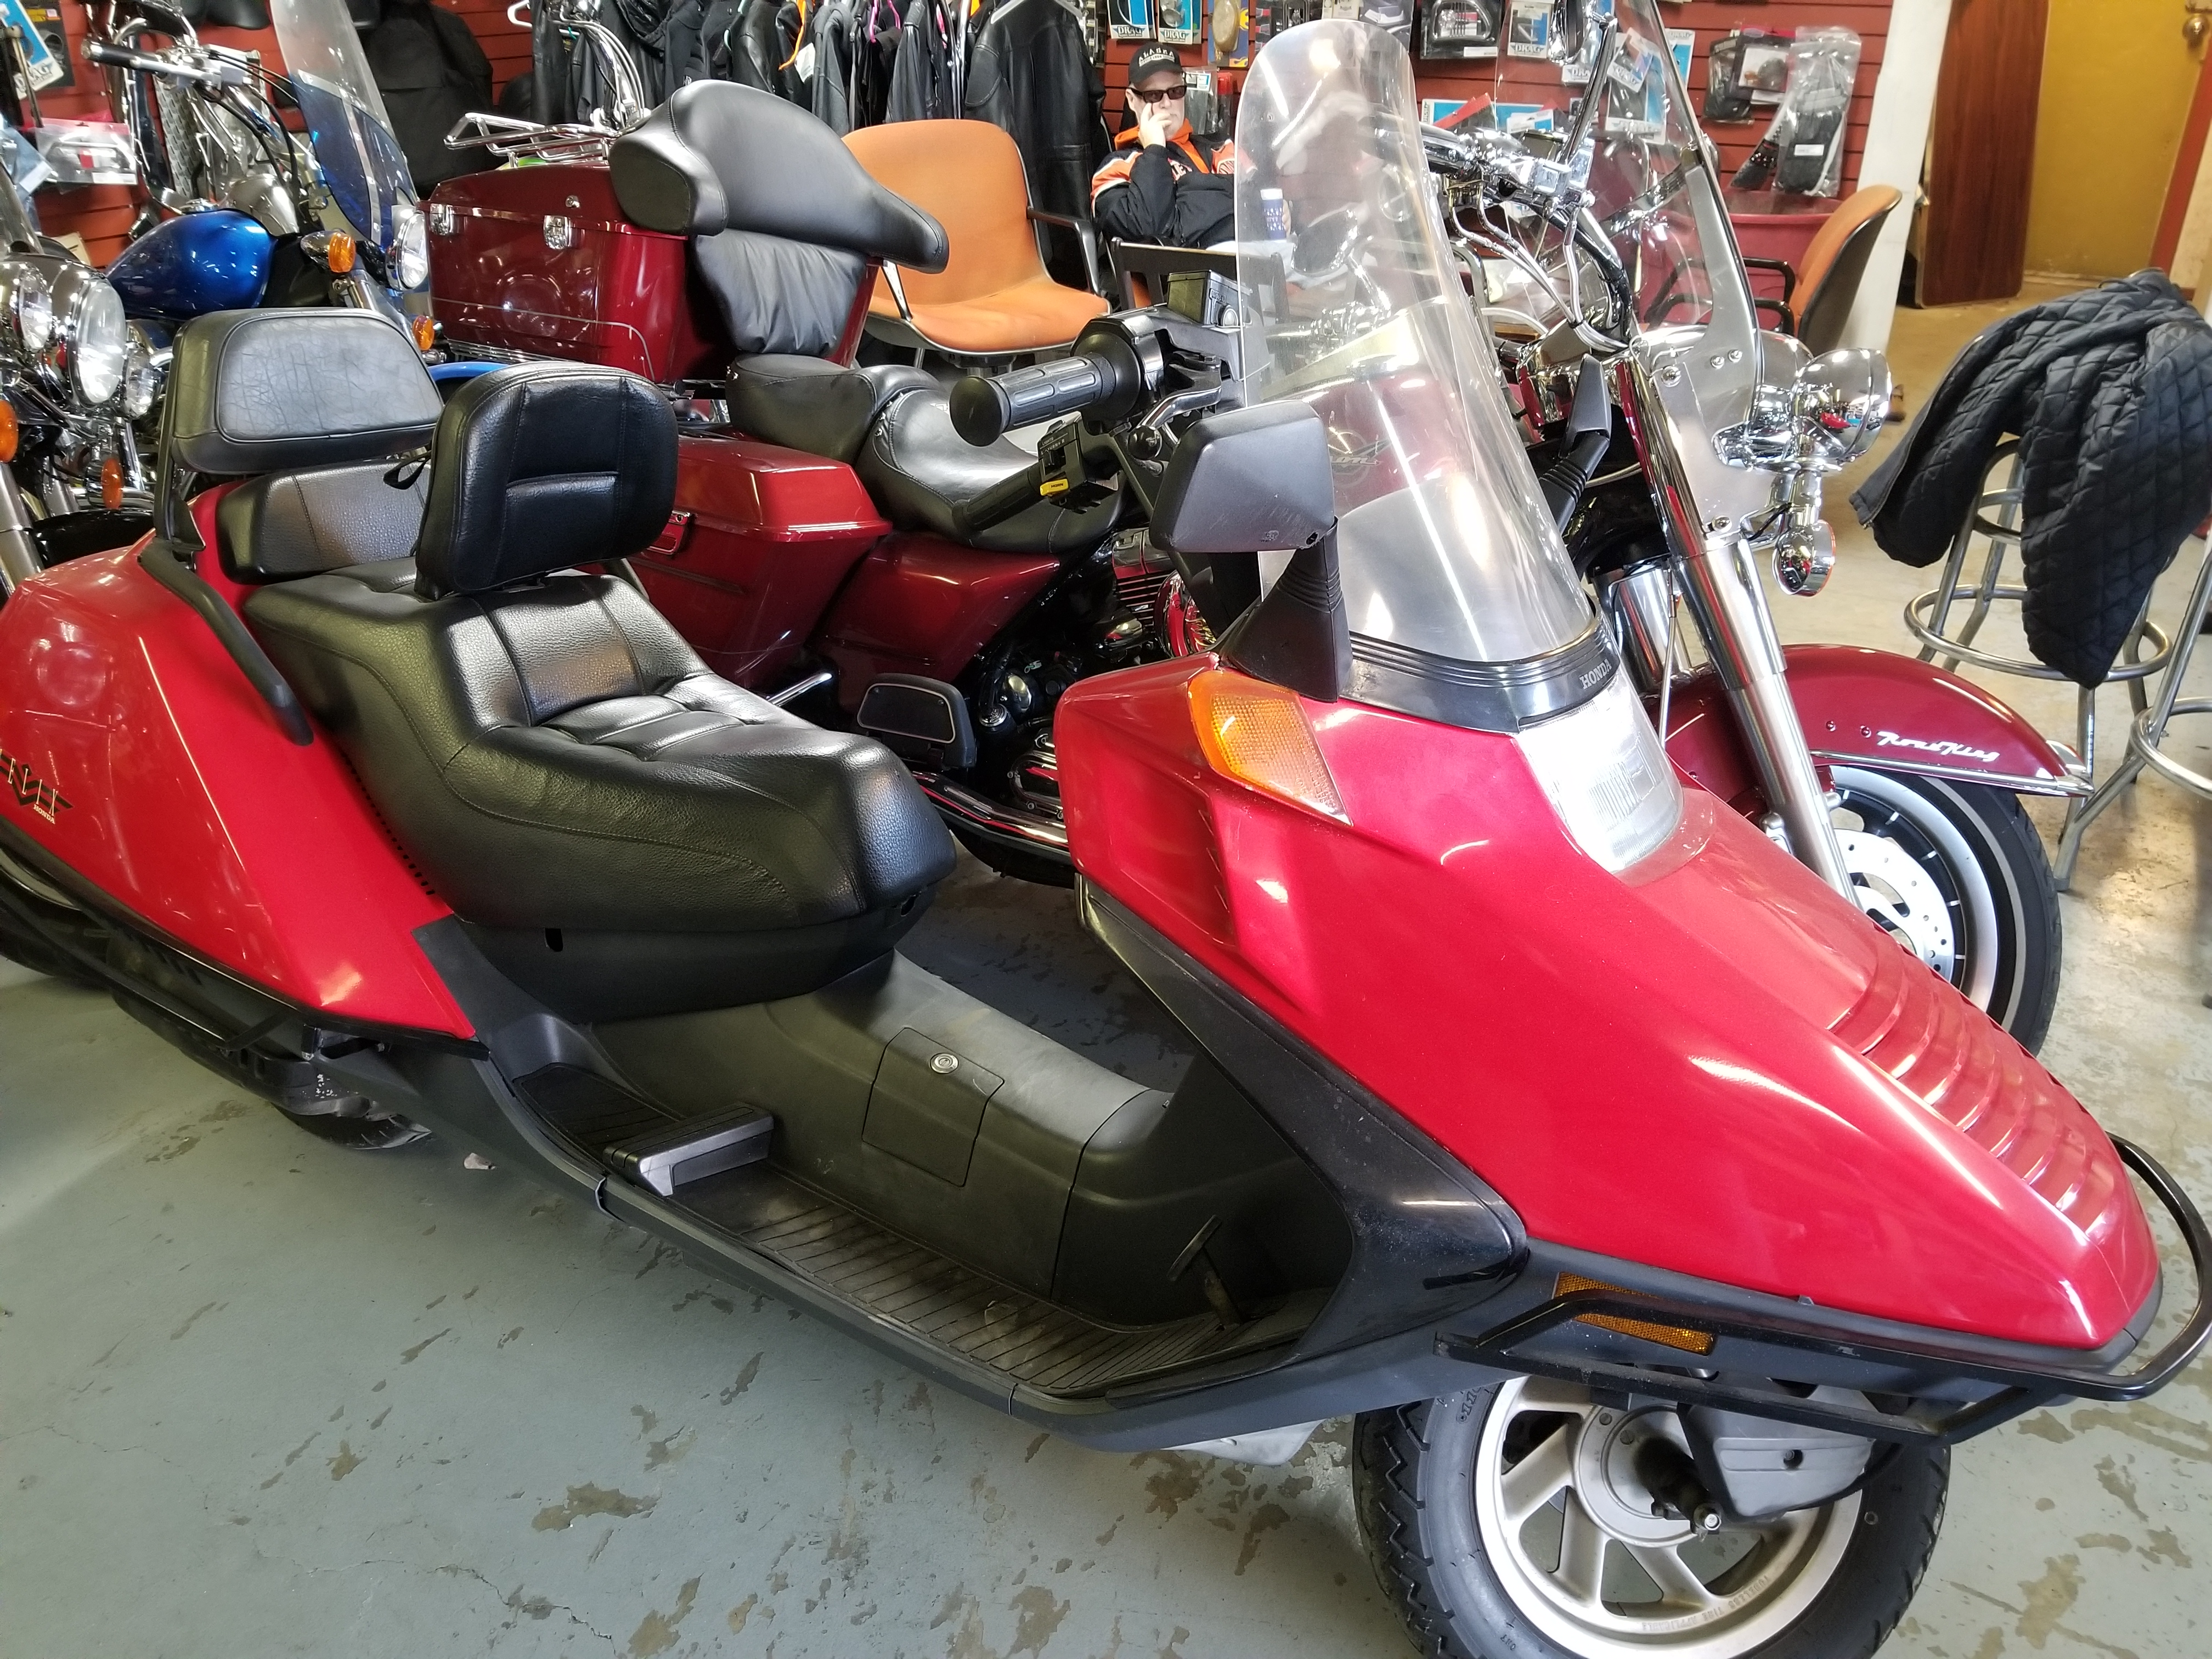 1997 Honda Helix 250 8,000 miles $1,700